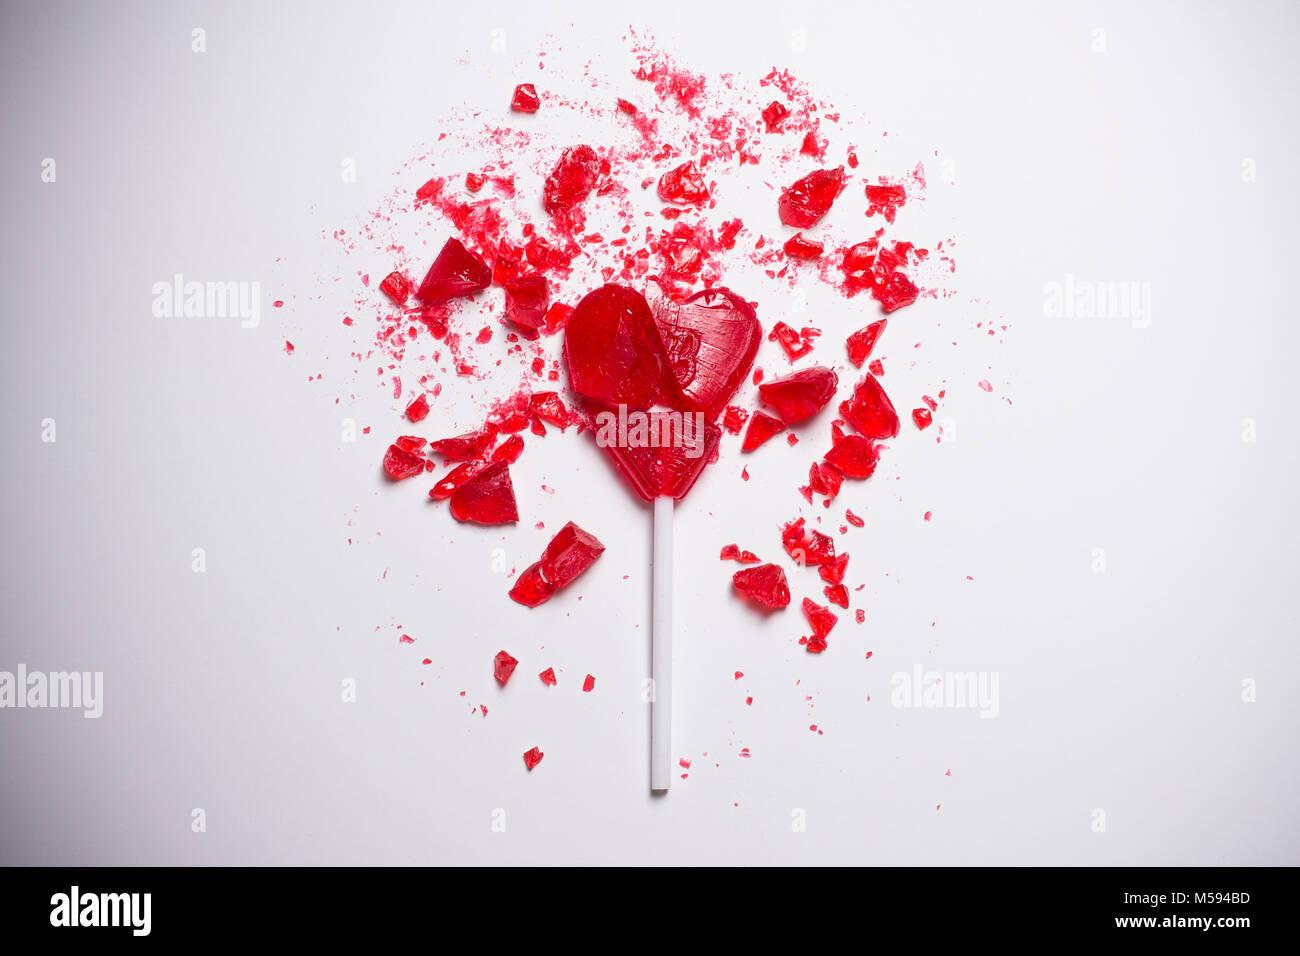 broken heart shaped lollipop - Stock Image